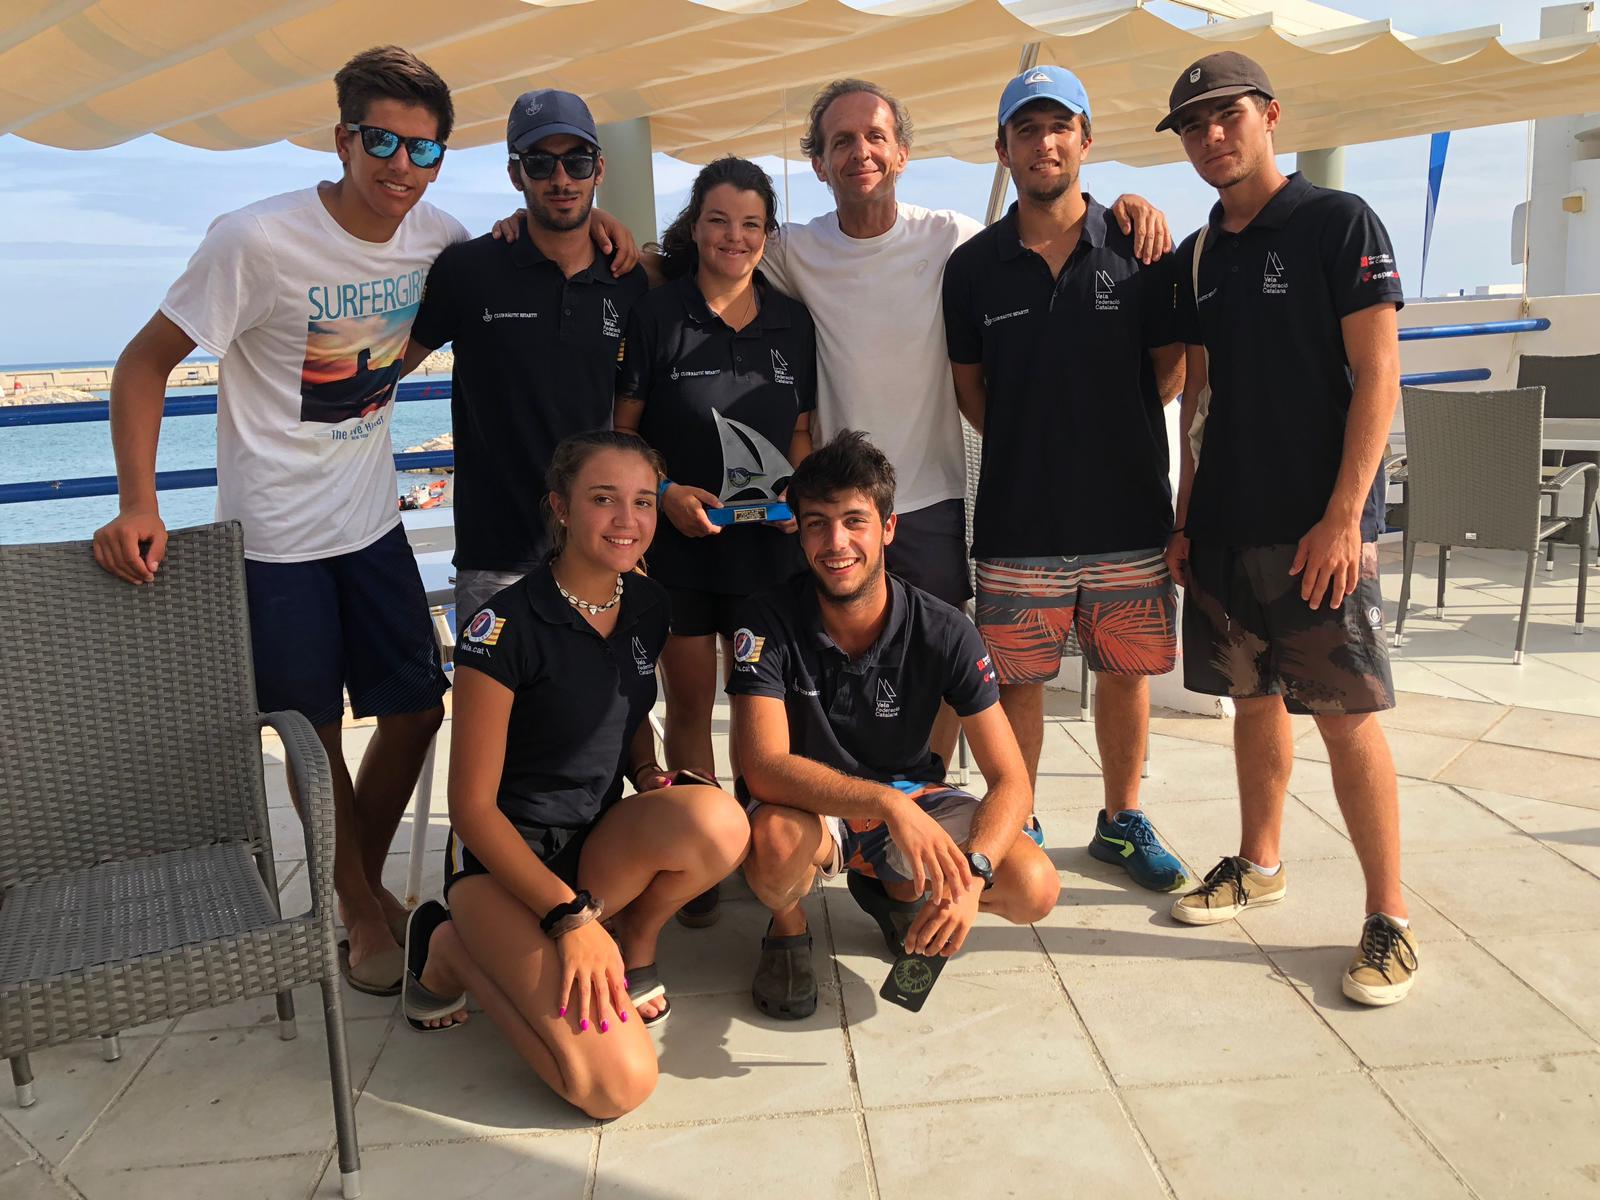 campionat_espanya_benalmadena_fotoequip